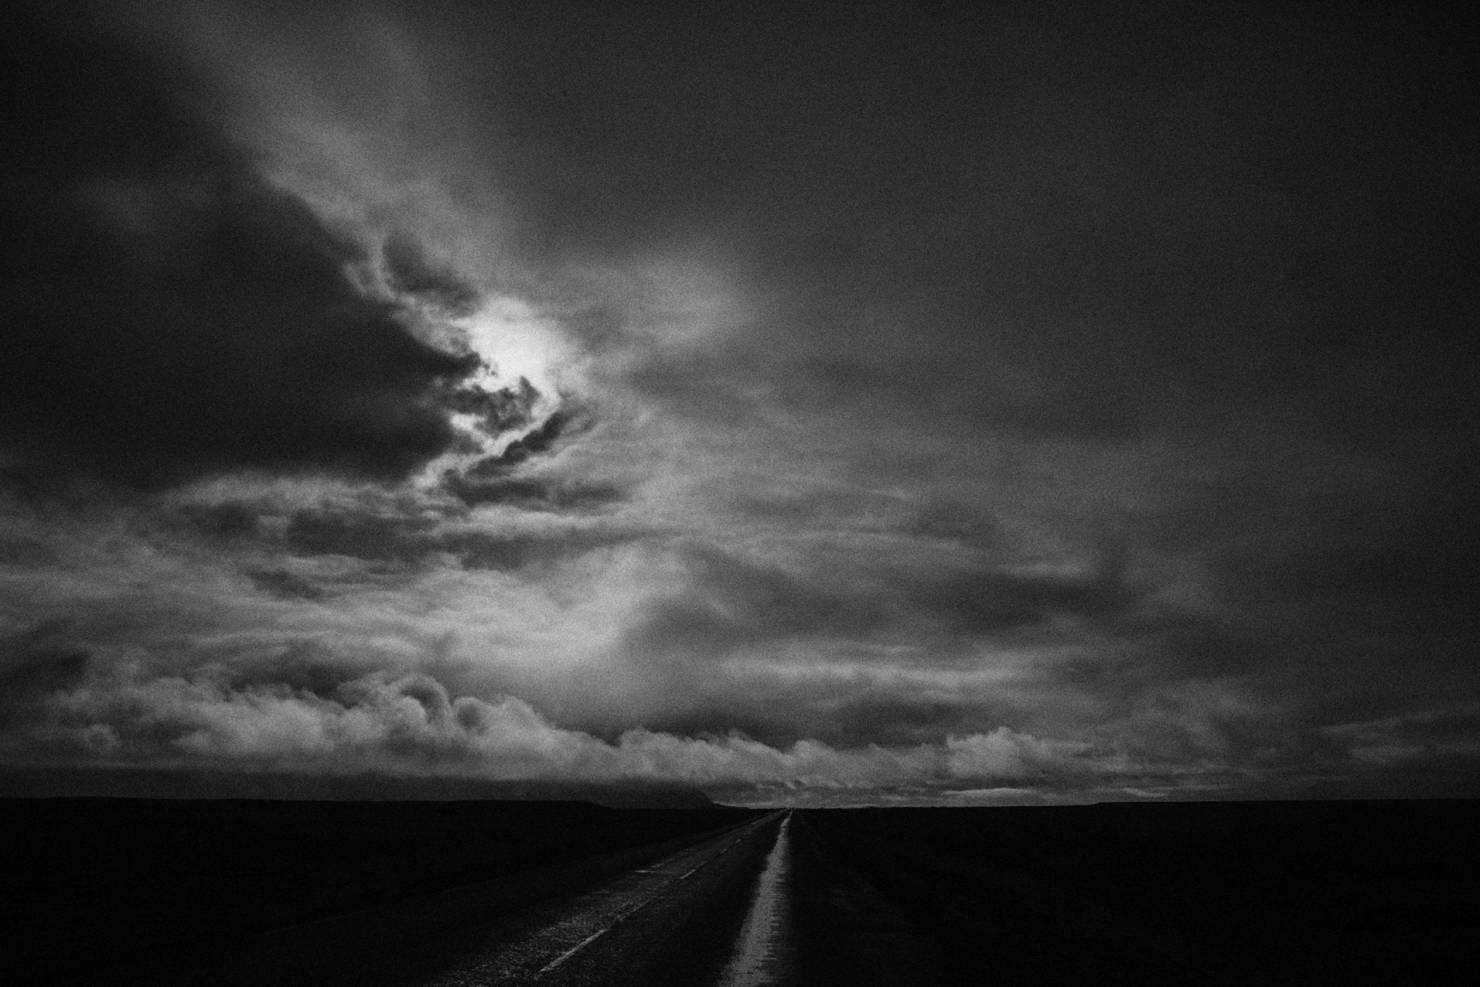 patrick_schuttler_landscape_iceland_008-f571ce7f1496f2607ad8c4f08ea06d1b